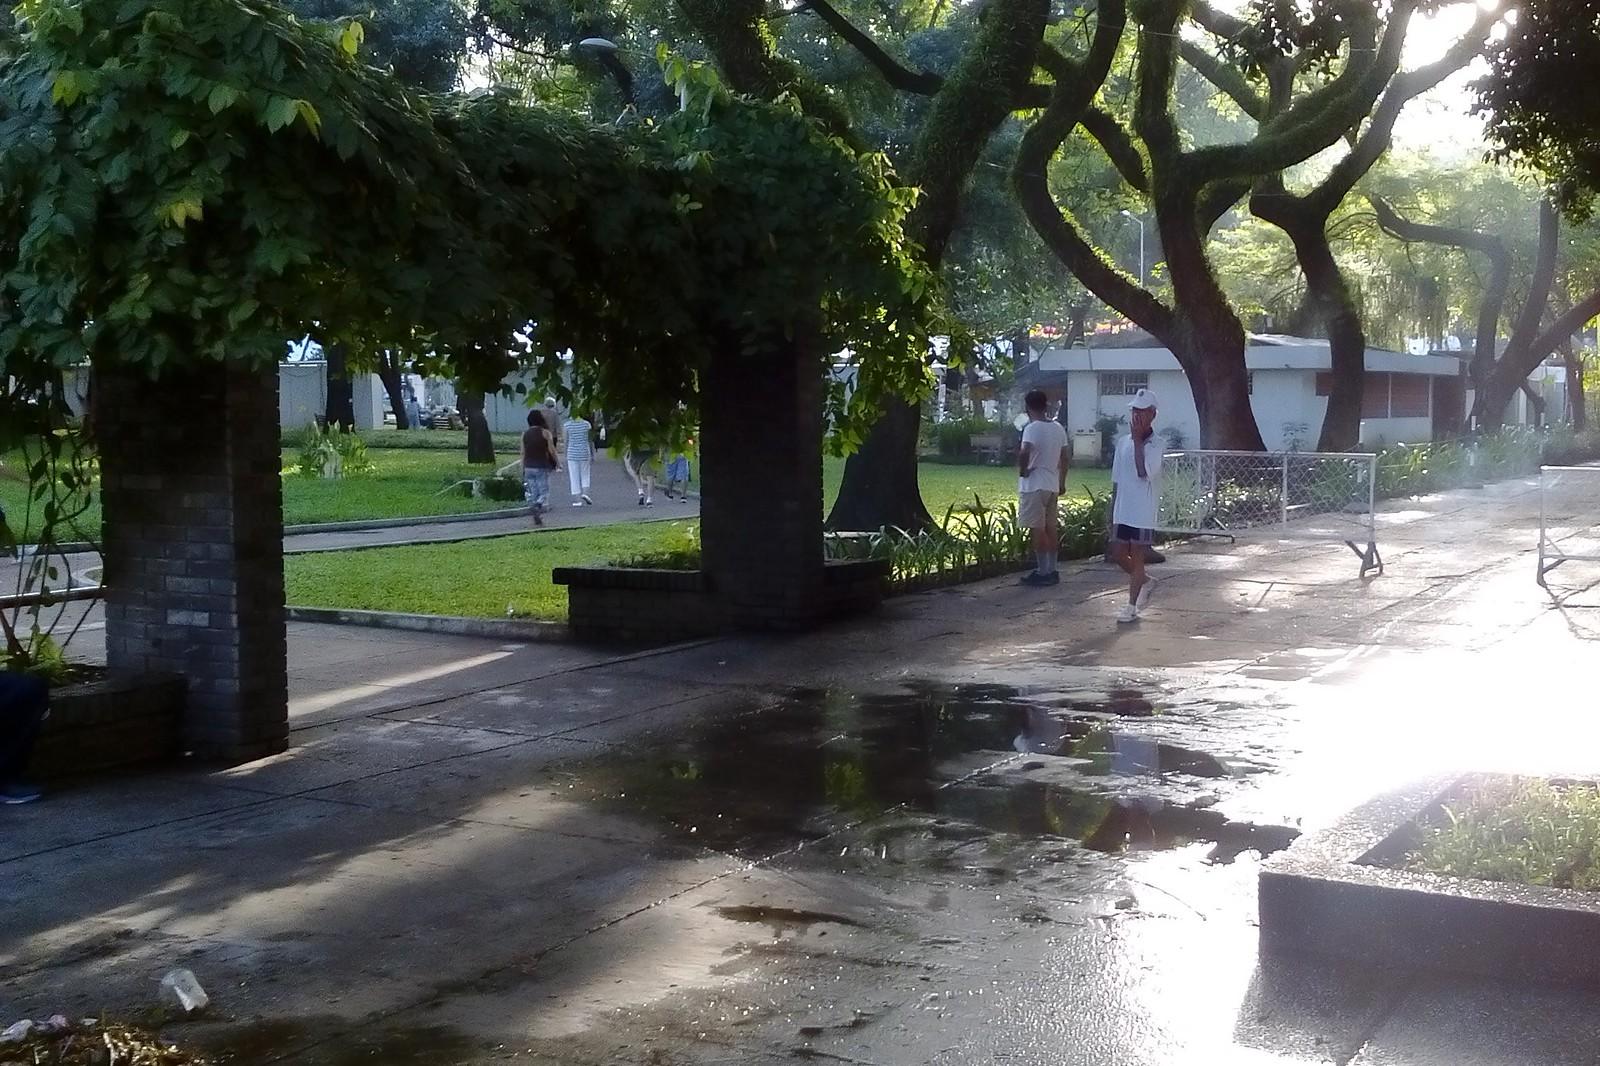 Le Van Tam Park on Monday after rainy Sunday